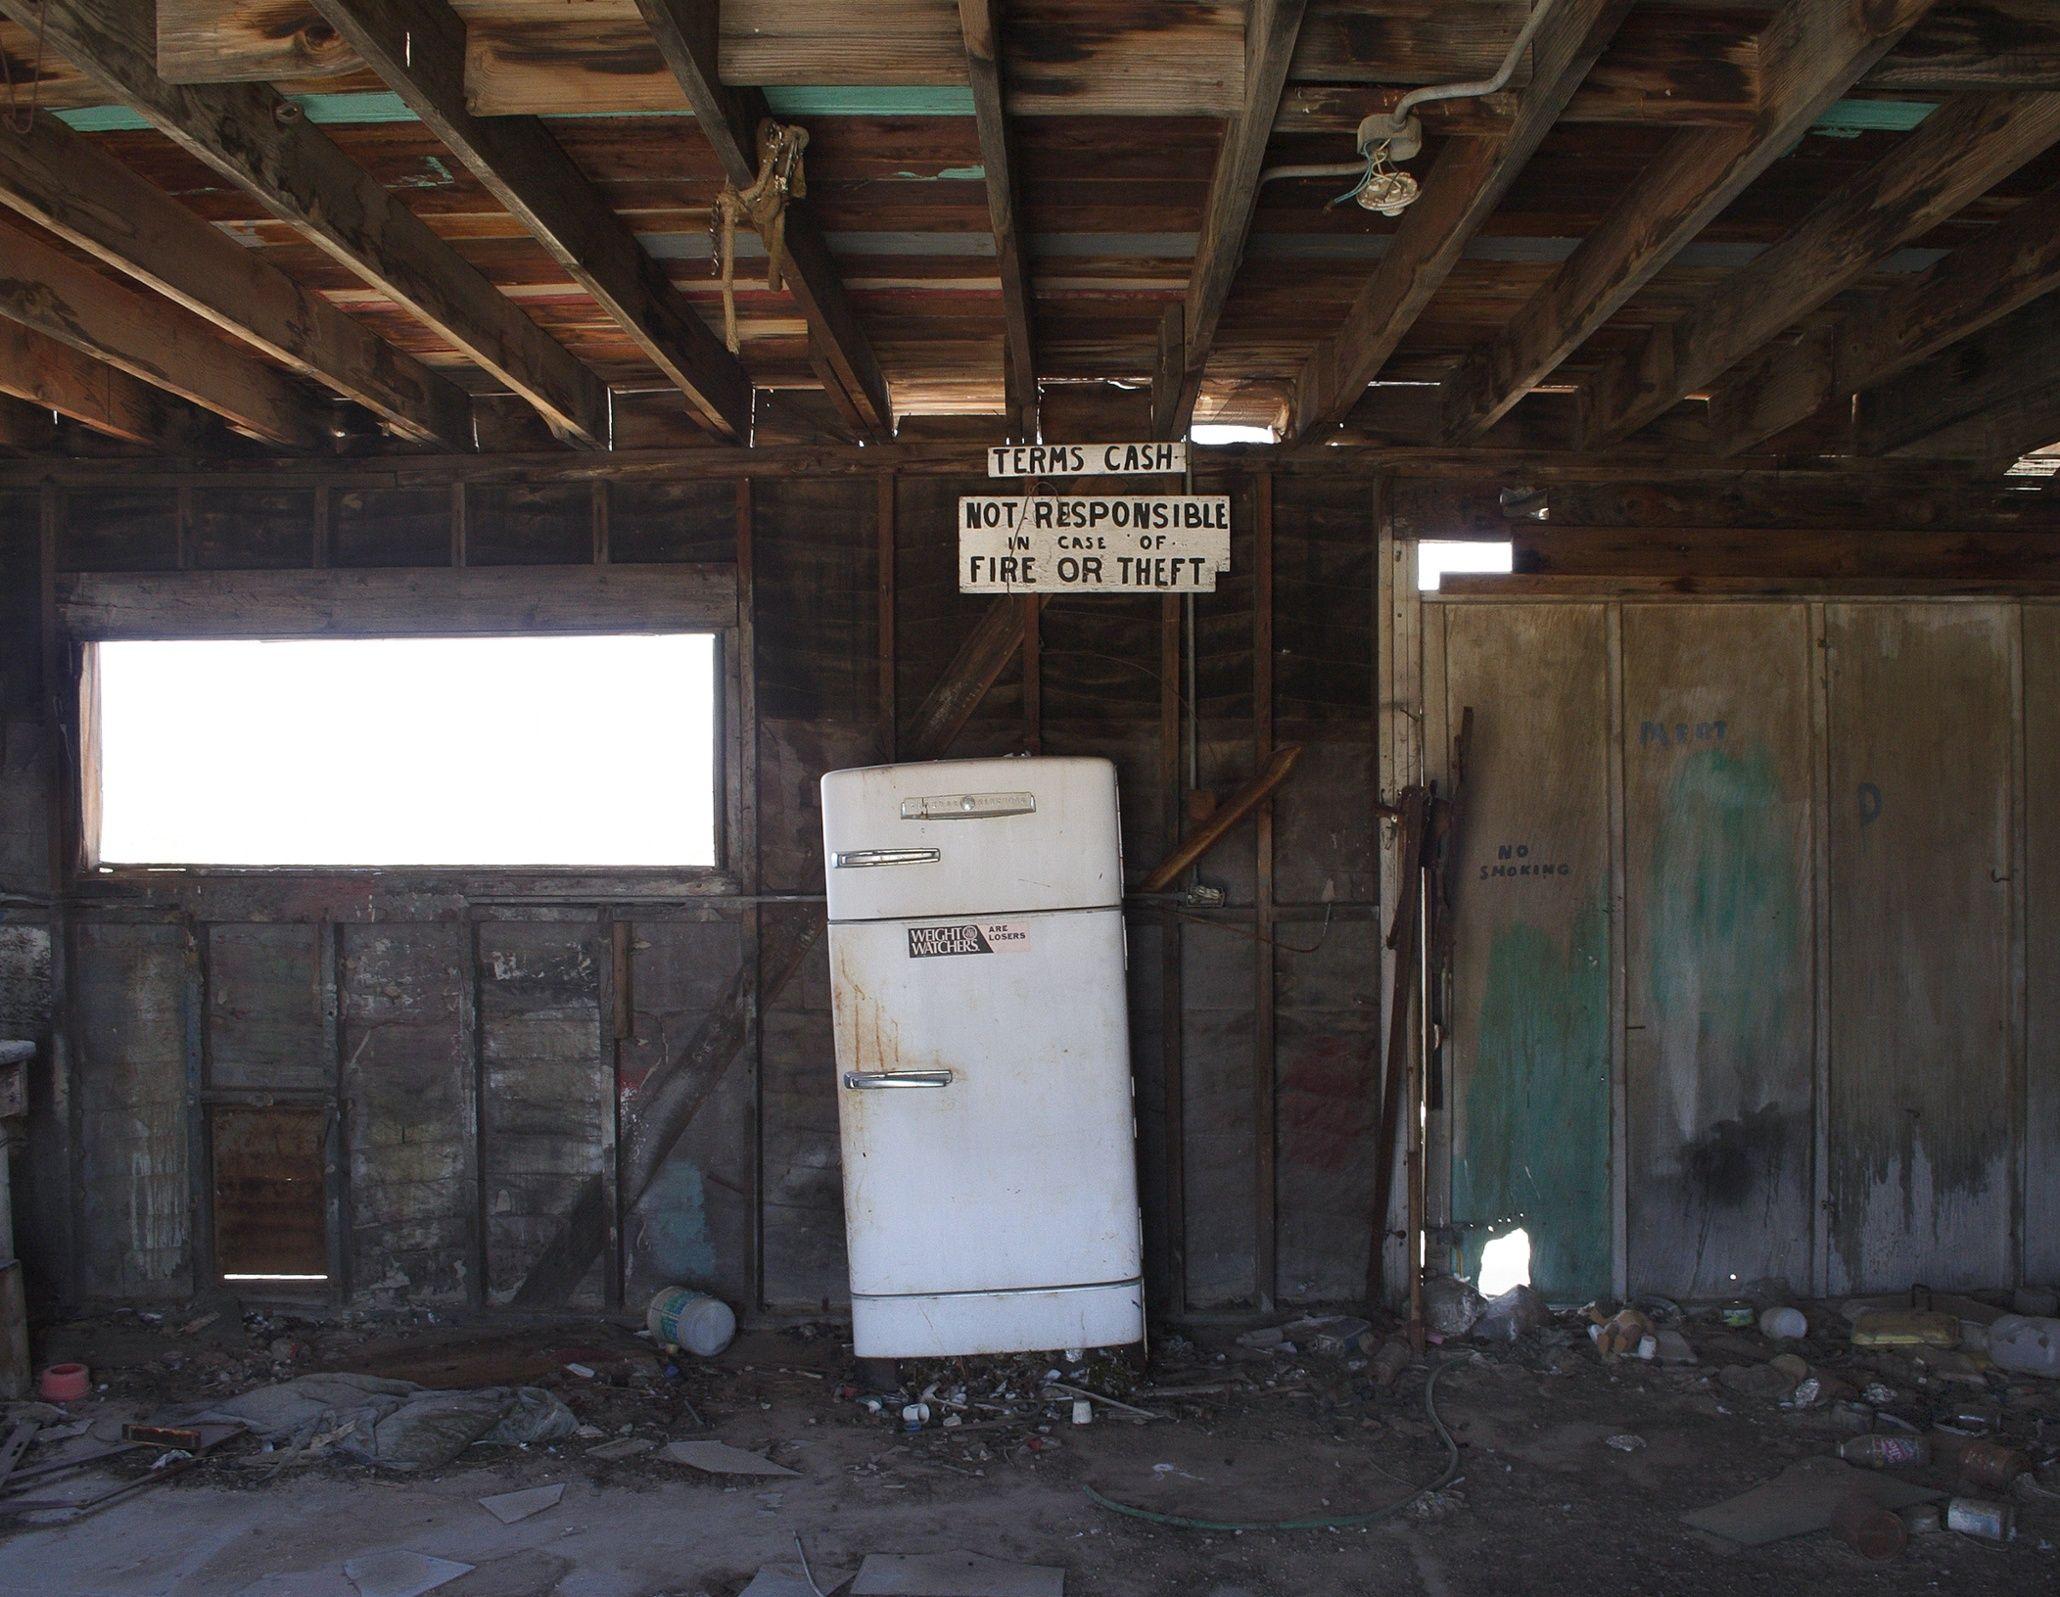 The Jackrabbit Homesteads of Wonder Valley | tiny houses | Pinterest